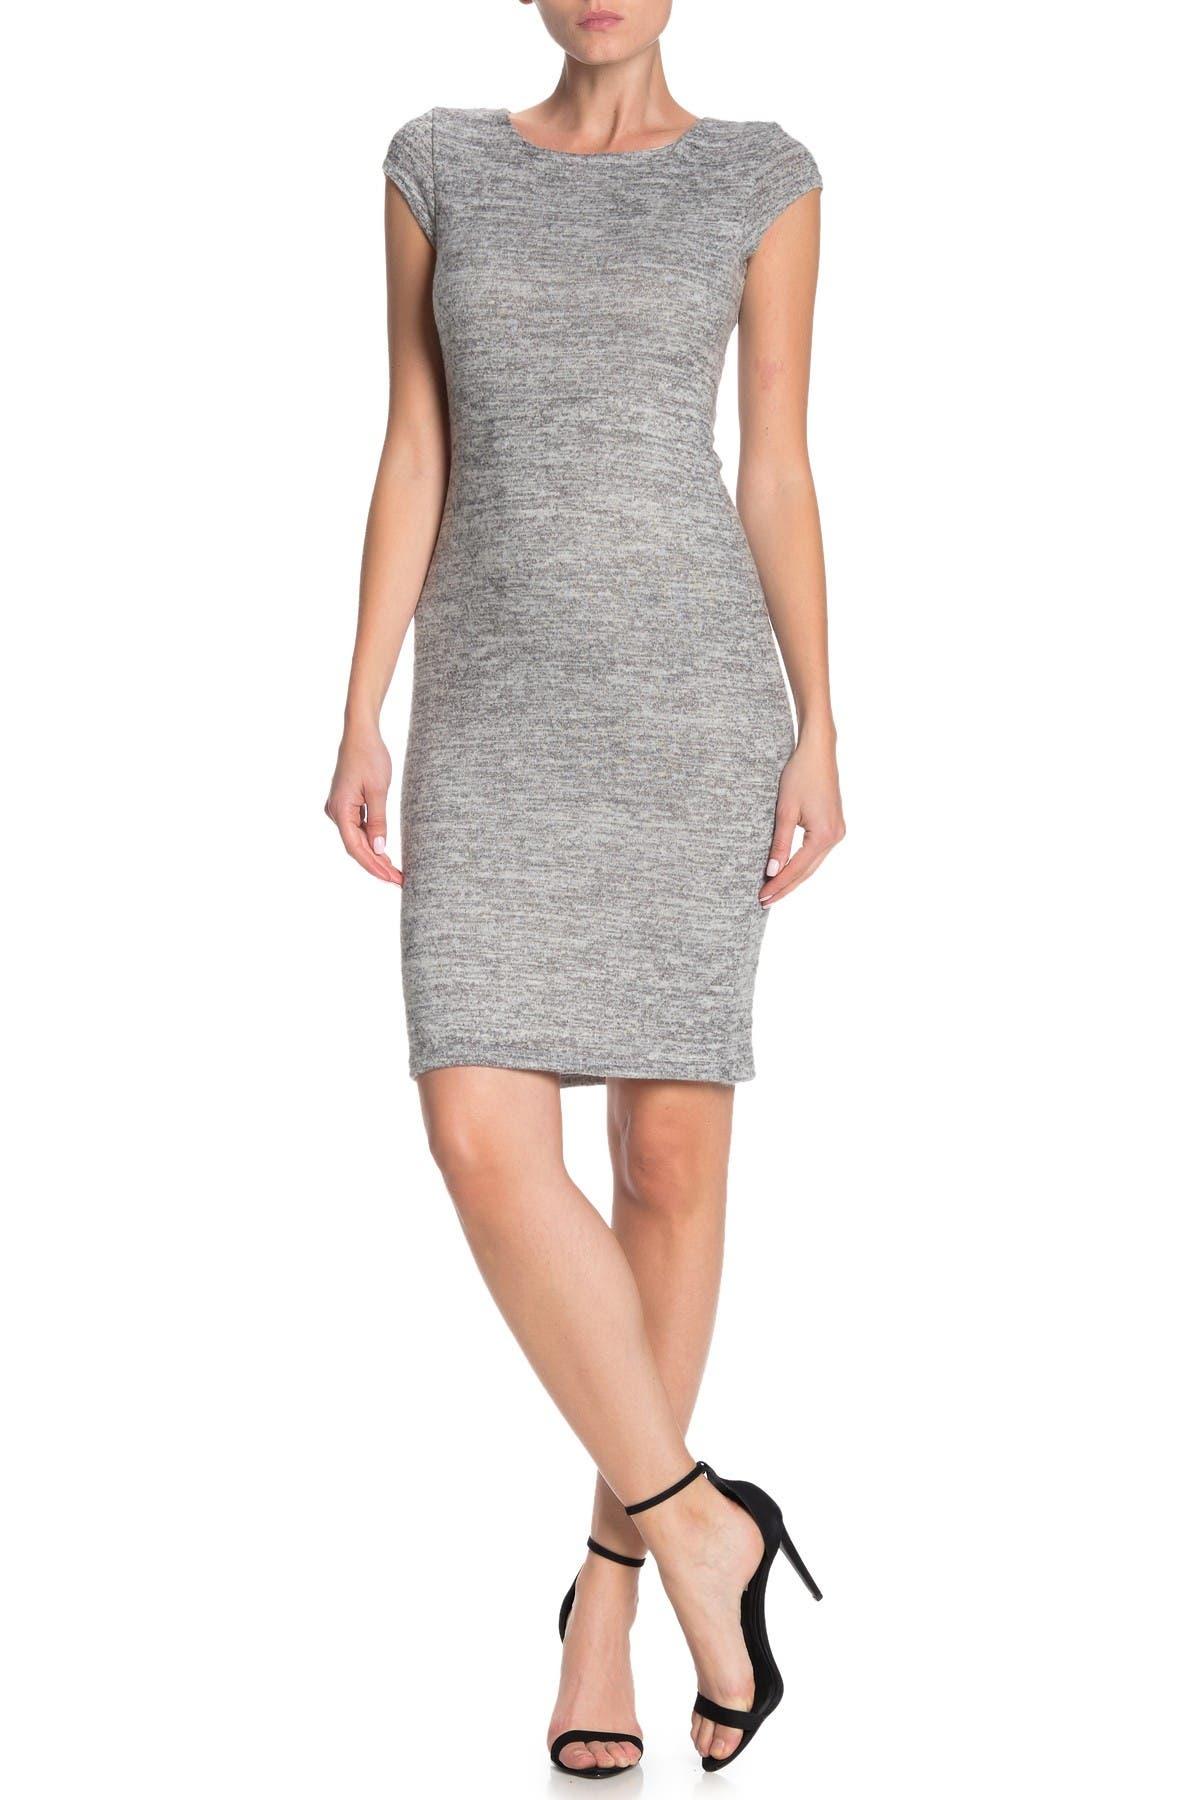 Image of Velvet Torch Brushed Cap Sleeve Bodycon Dress